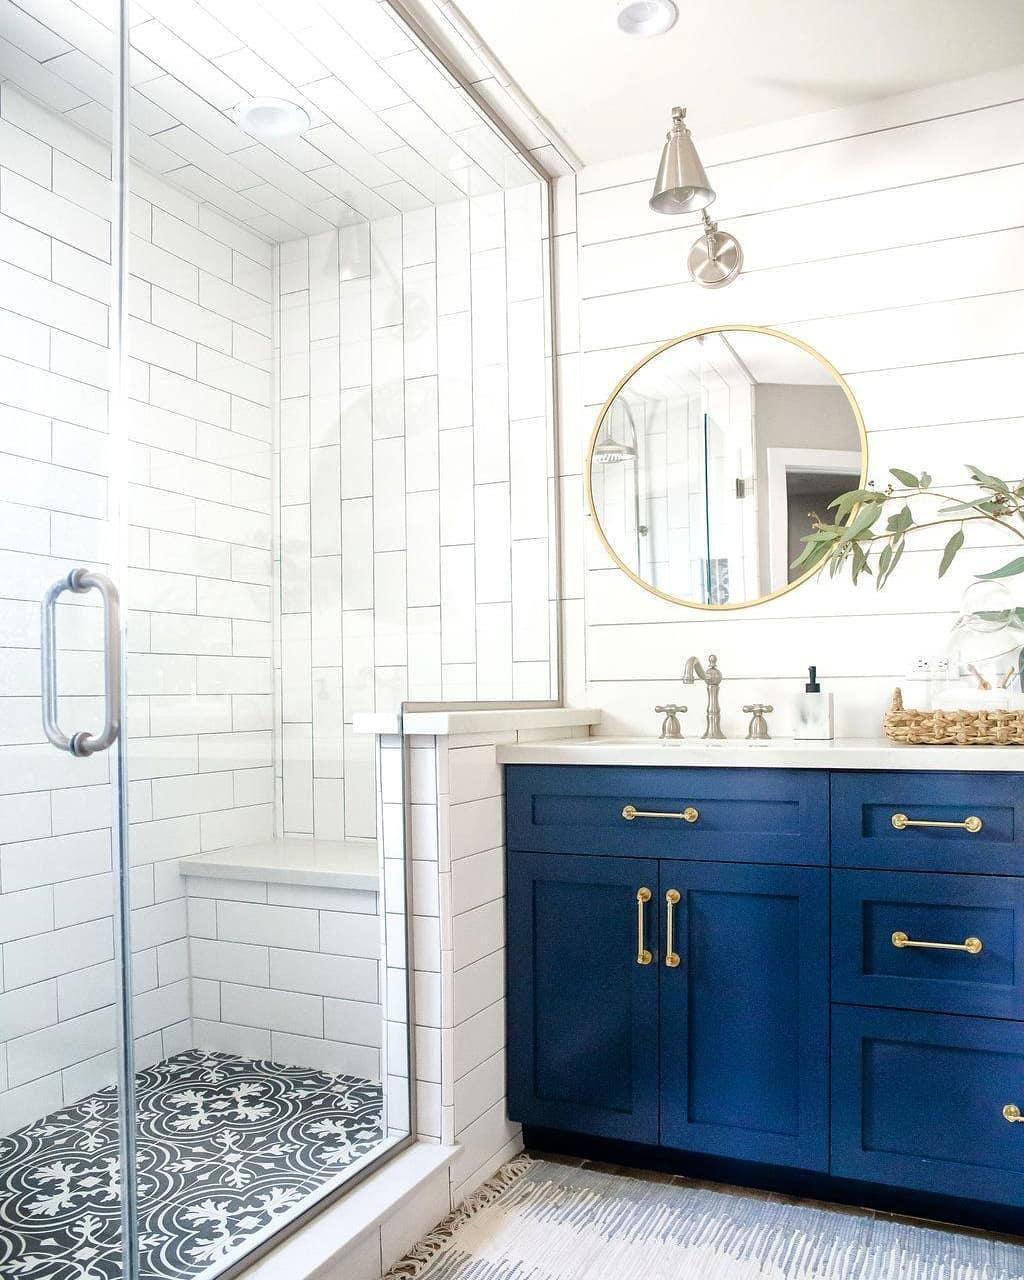 Fashionable nautical bathroom